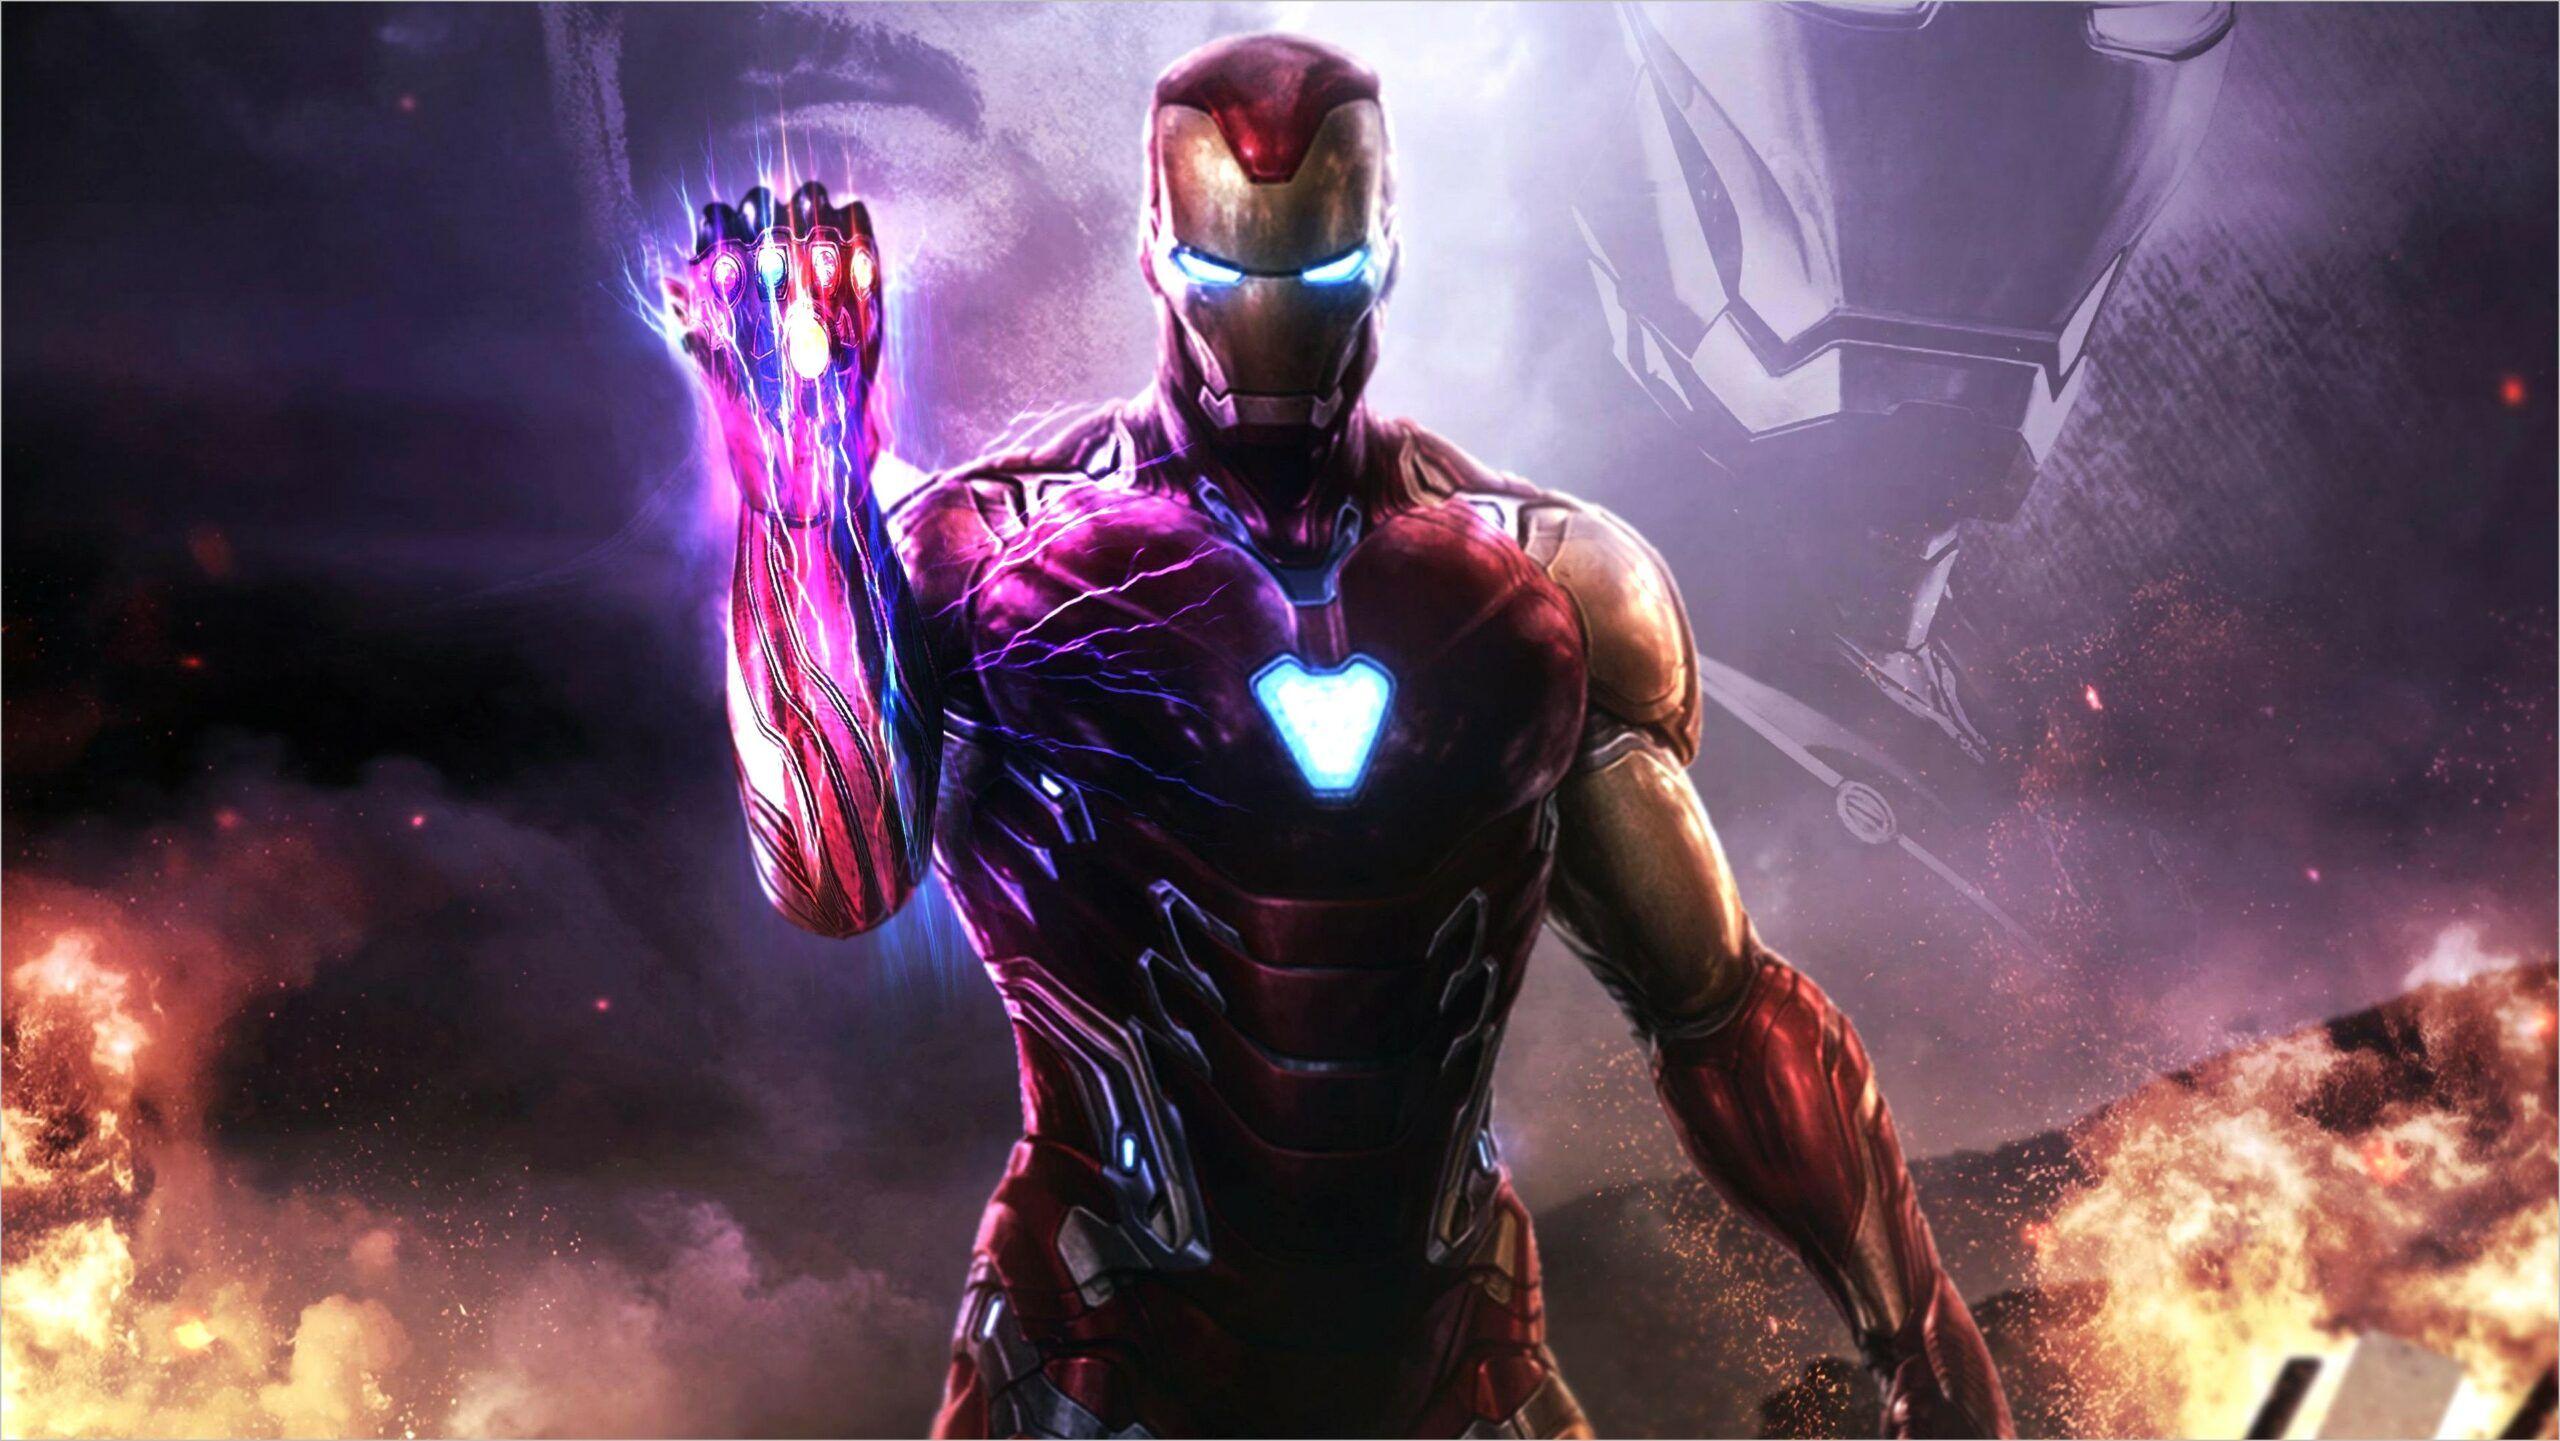 Ironman 4k Wallpaper Galaxy S9 Plus Iron Man Wallpaper Iron Man Hd Wallpaper Iron Man Hd Images